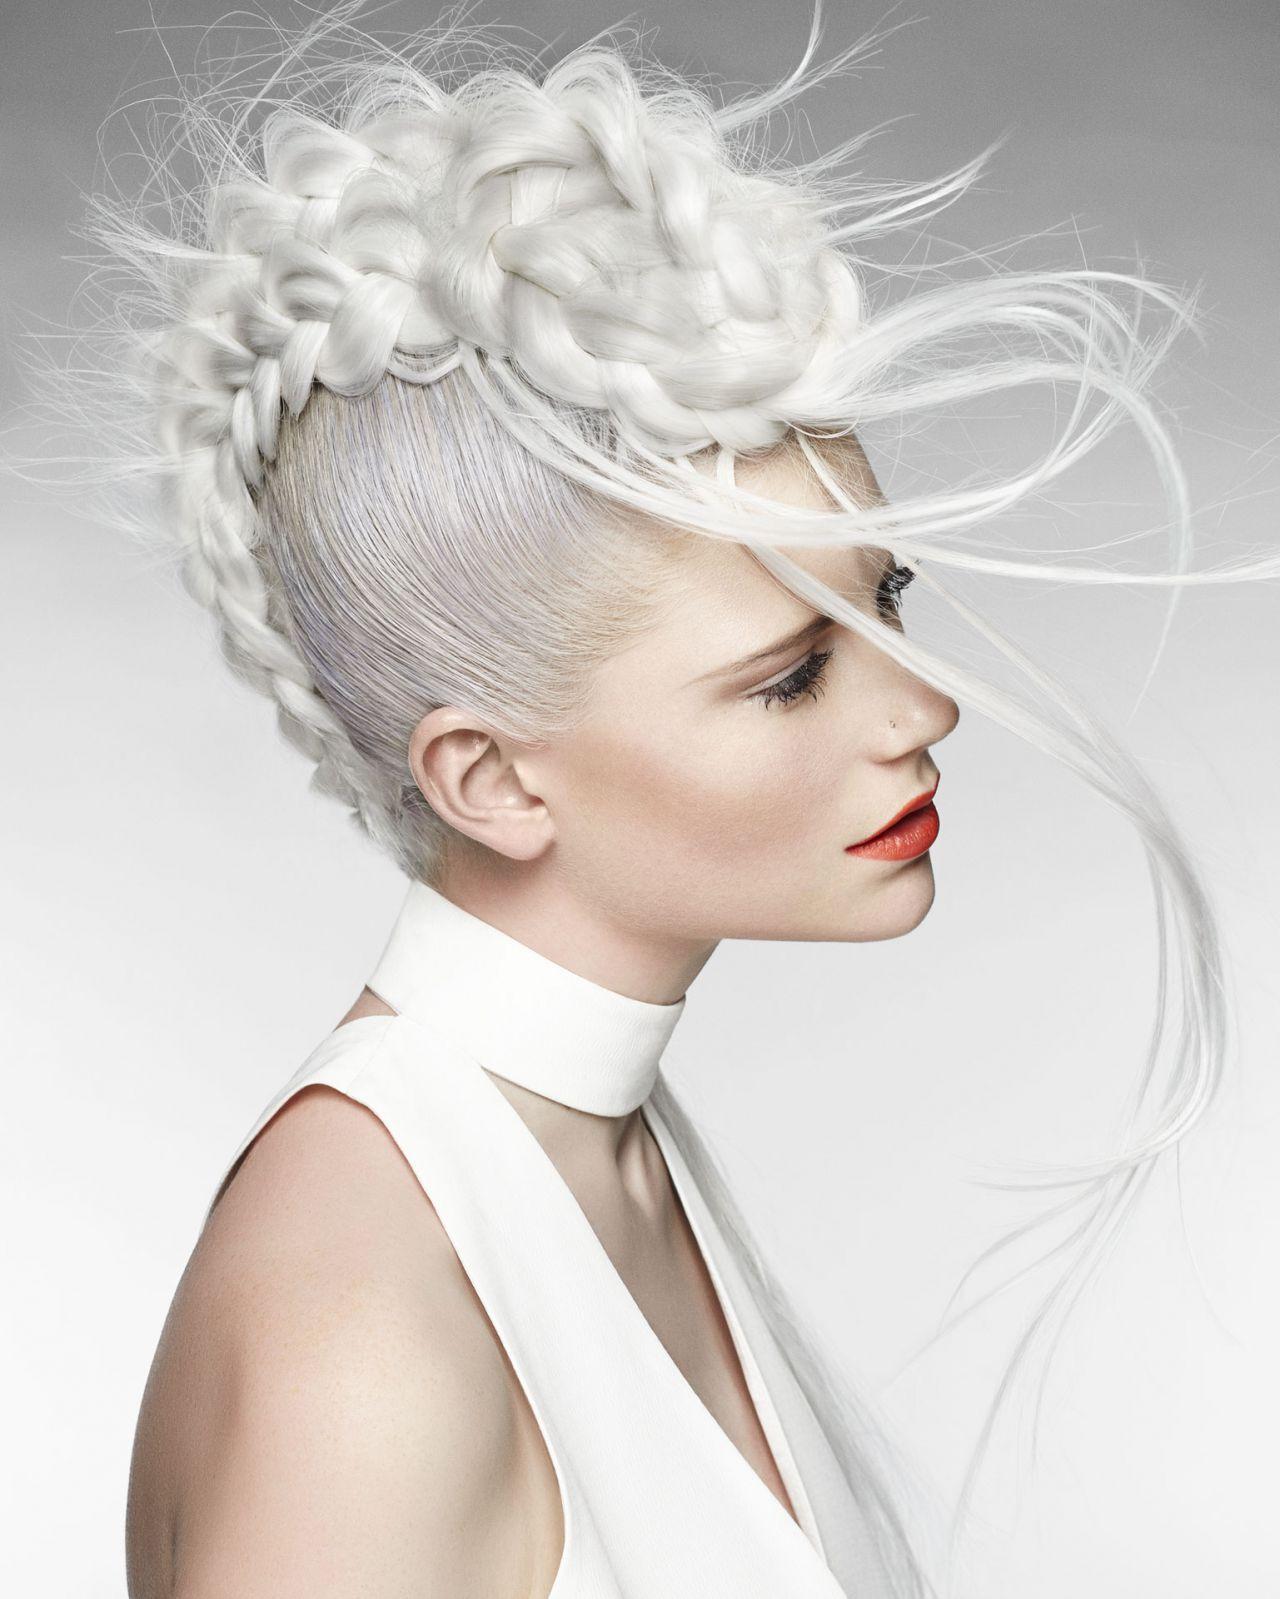 Sam Millard Peter Prosser Oslo | Cute & Cool Hair | Pinterest | Oslo ...